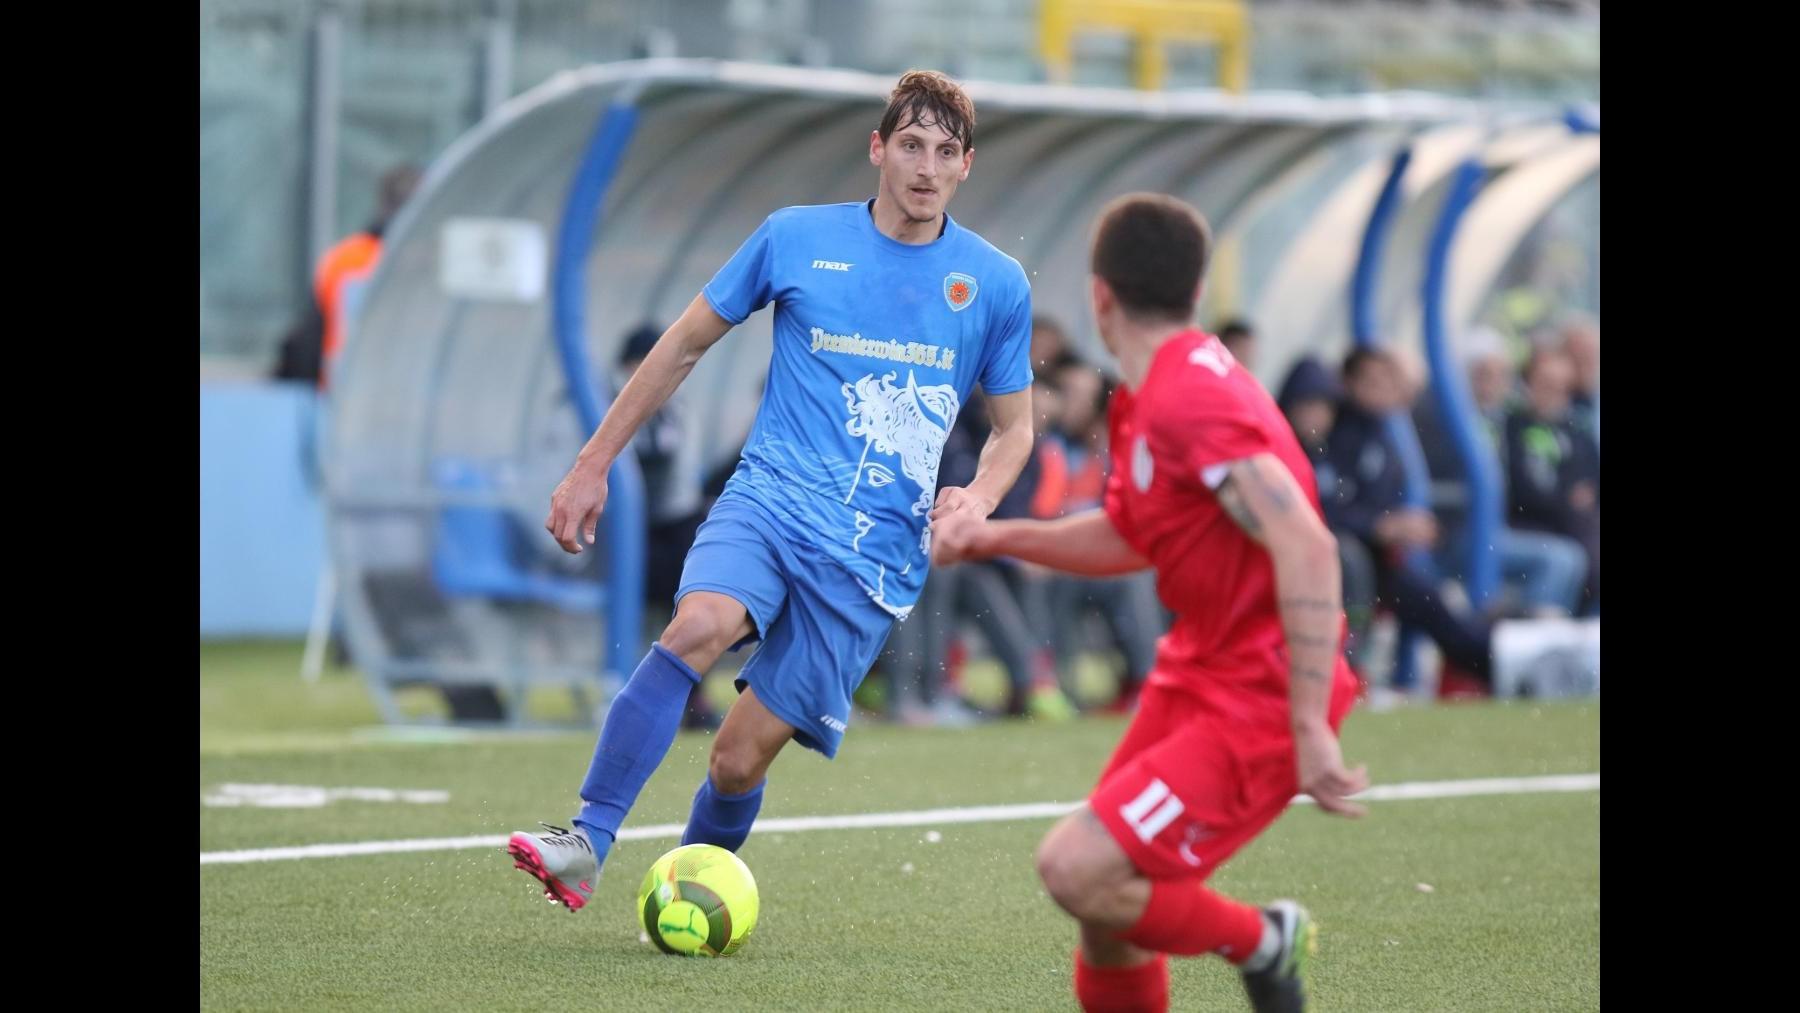 Lega Pro, Siracusa-Akragas 1-0 | IL FOTORACCONTO